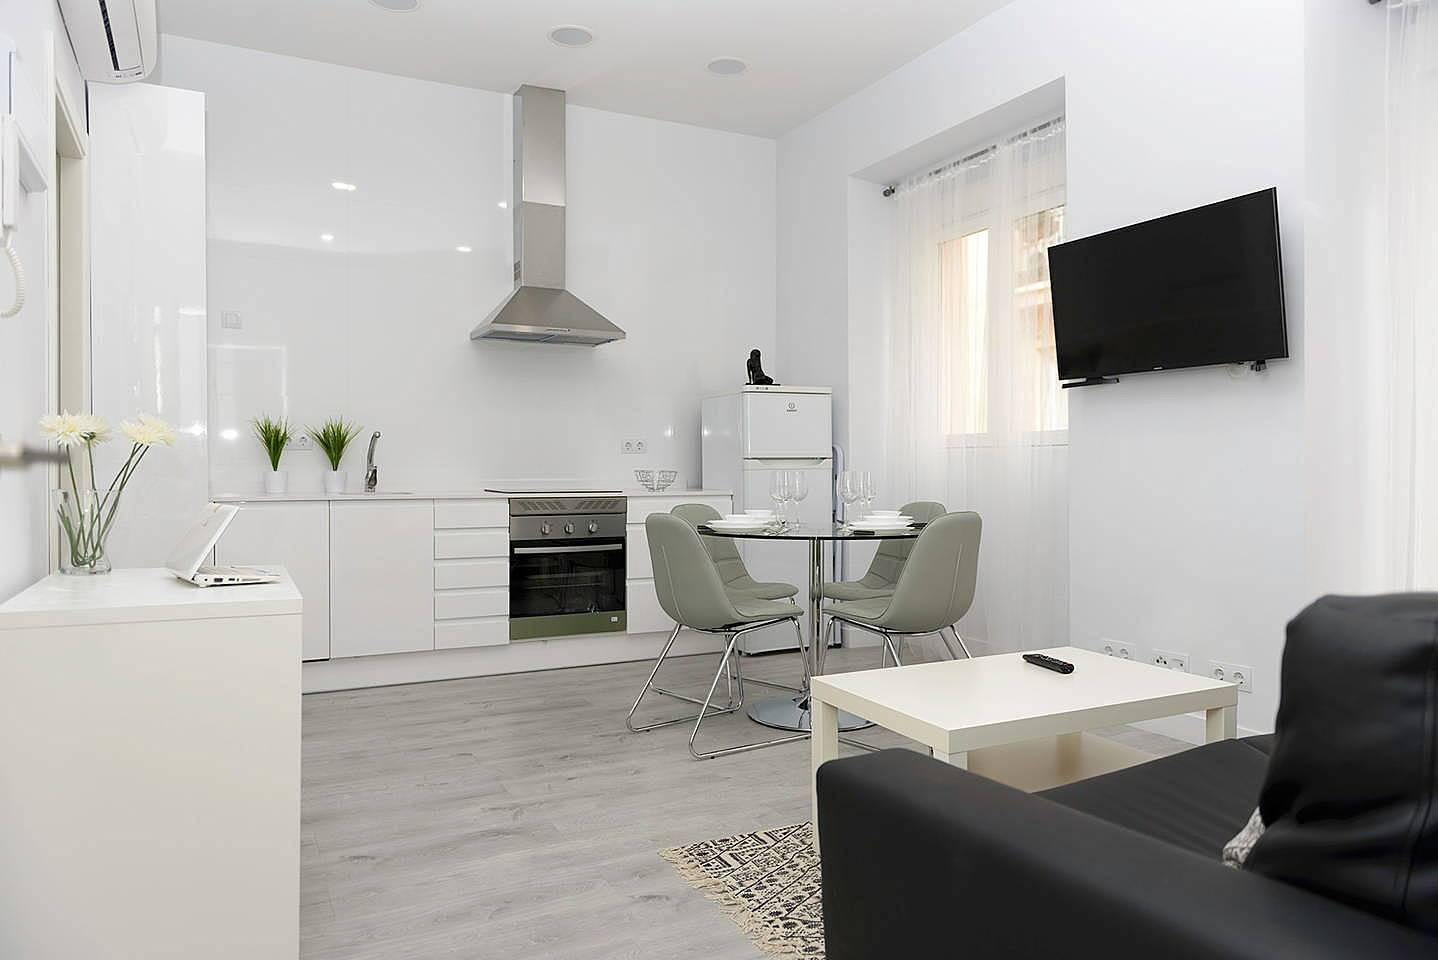 Apartamento en alquiler en madrid lavapi s madrid - Apartamentos alquiler madrid baratos ...